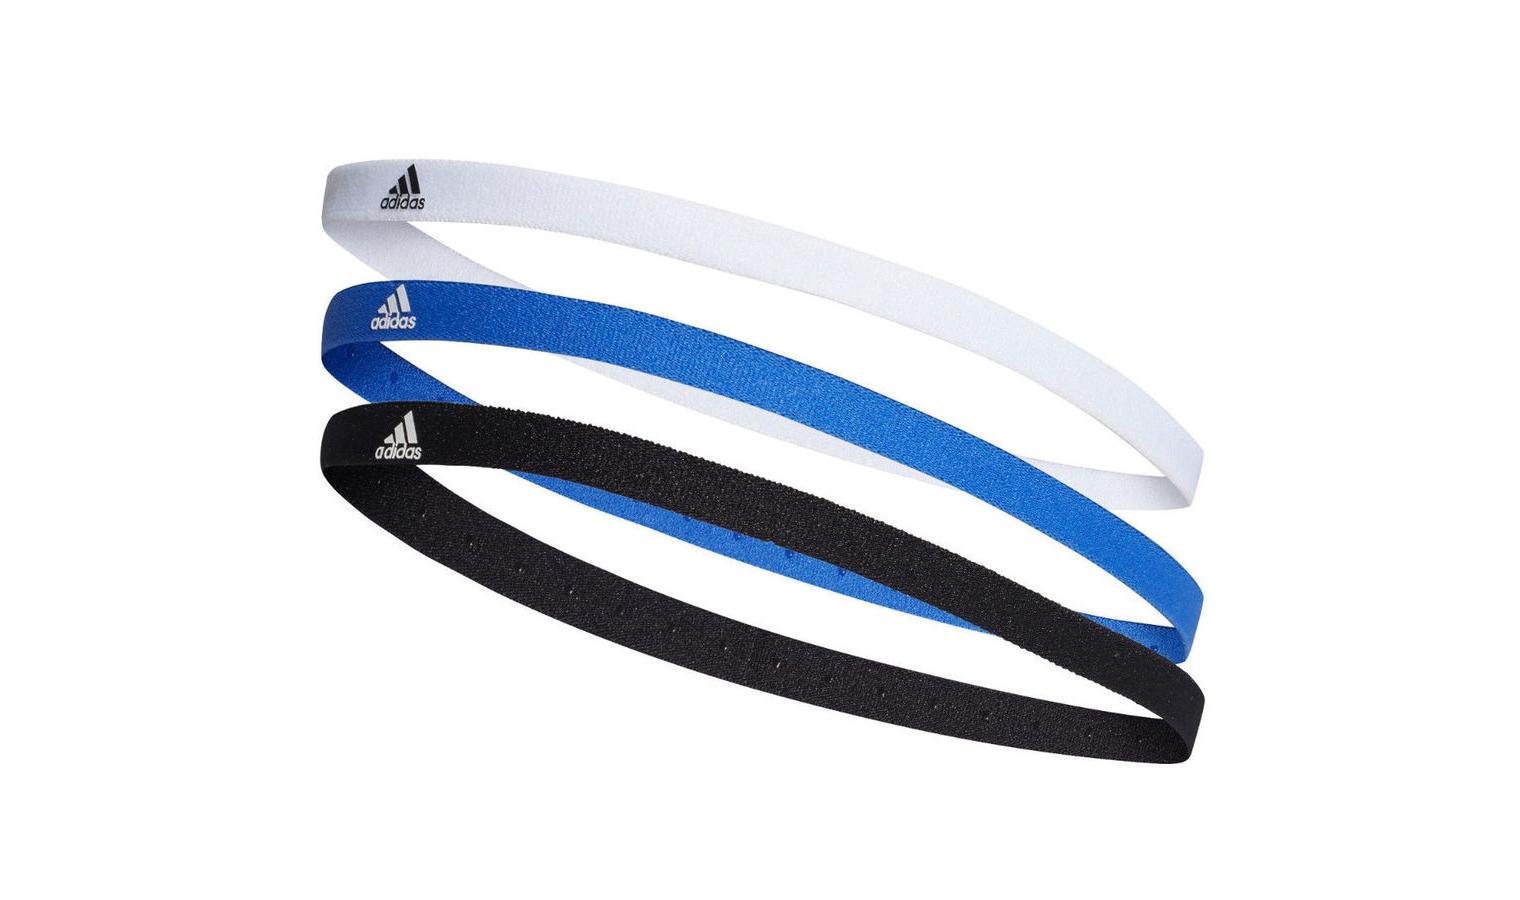 9eba376b277 Dámská čelenka adidas 3PP HAIRBAND barevné